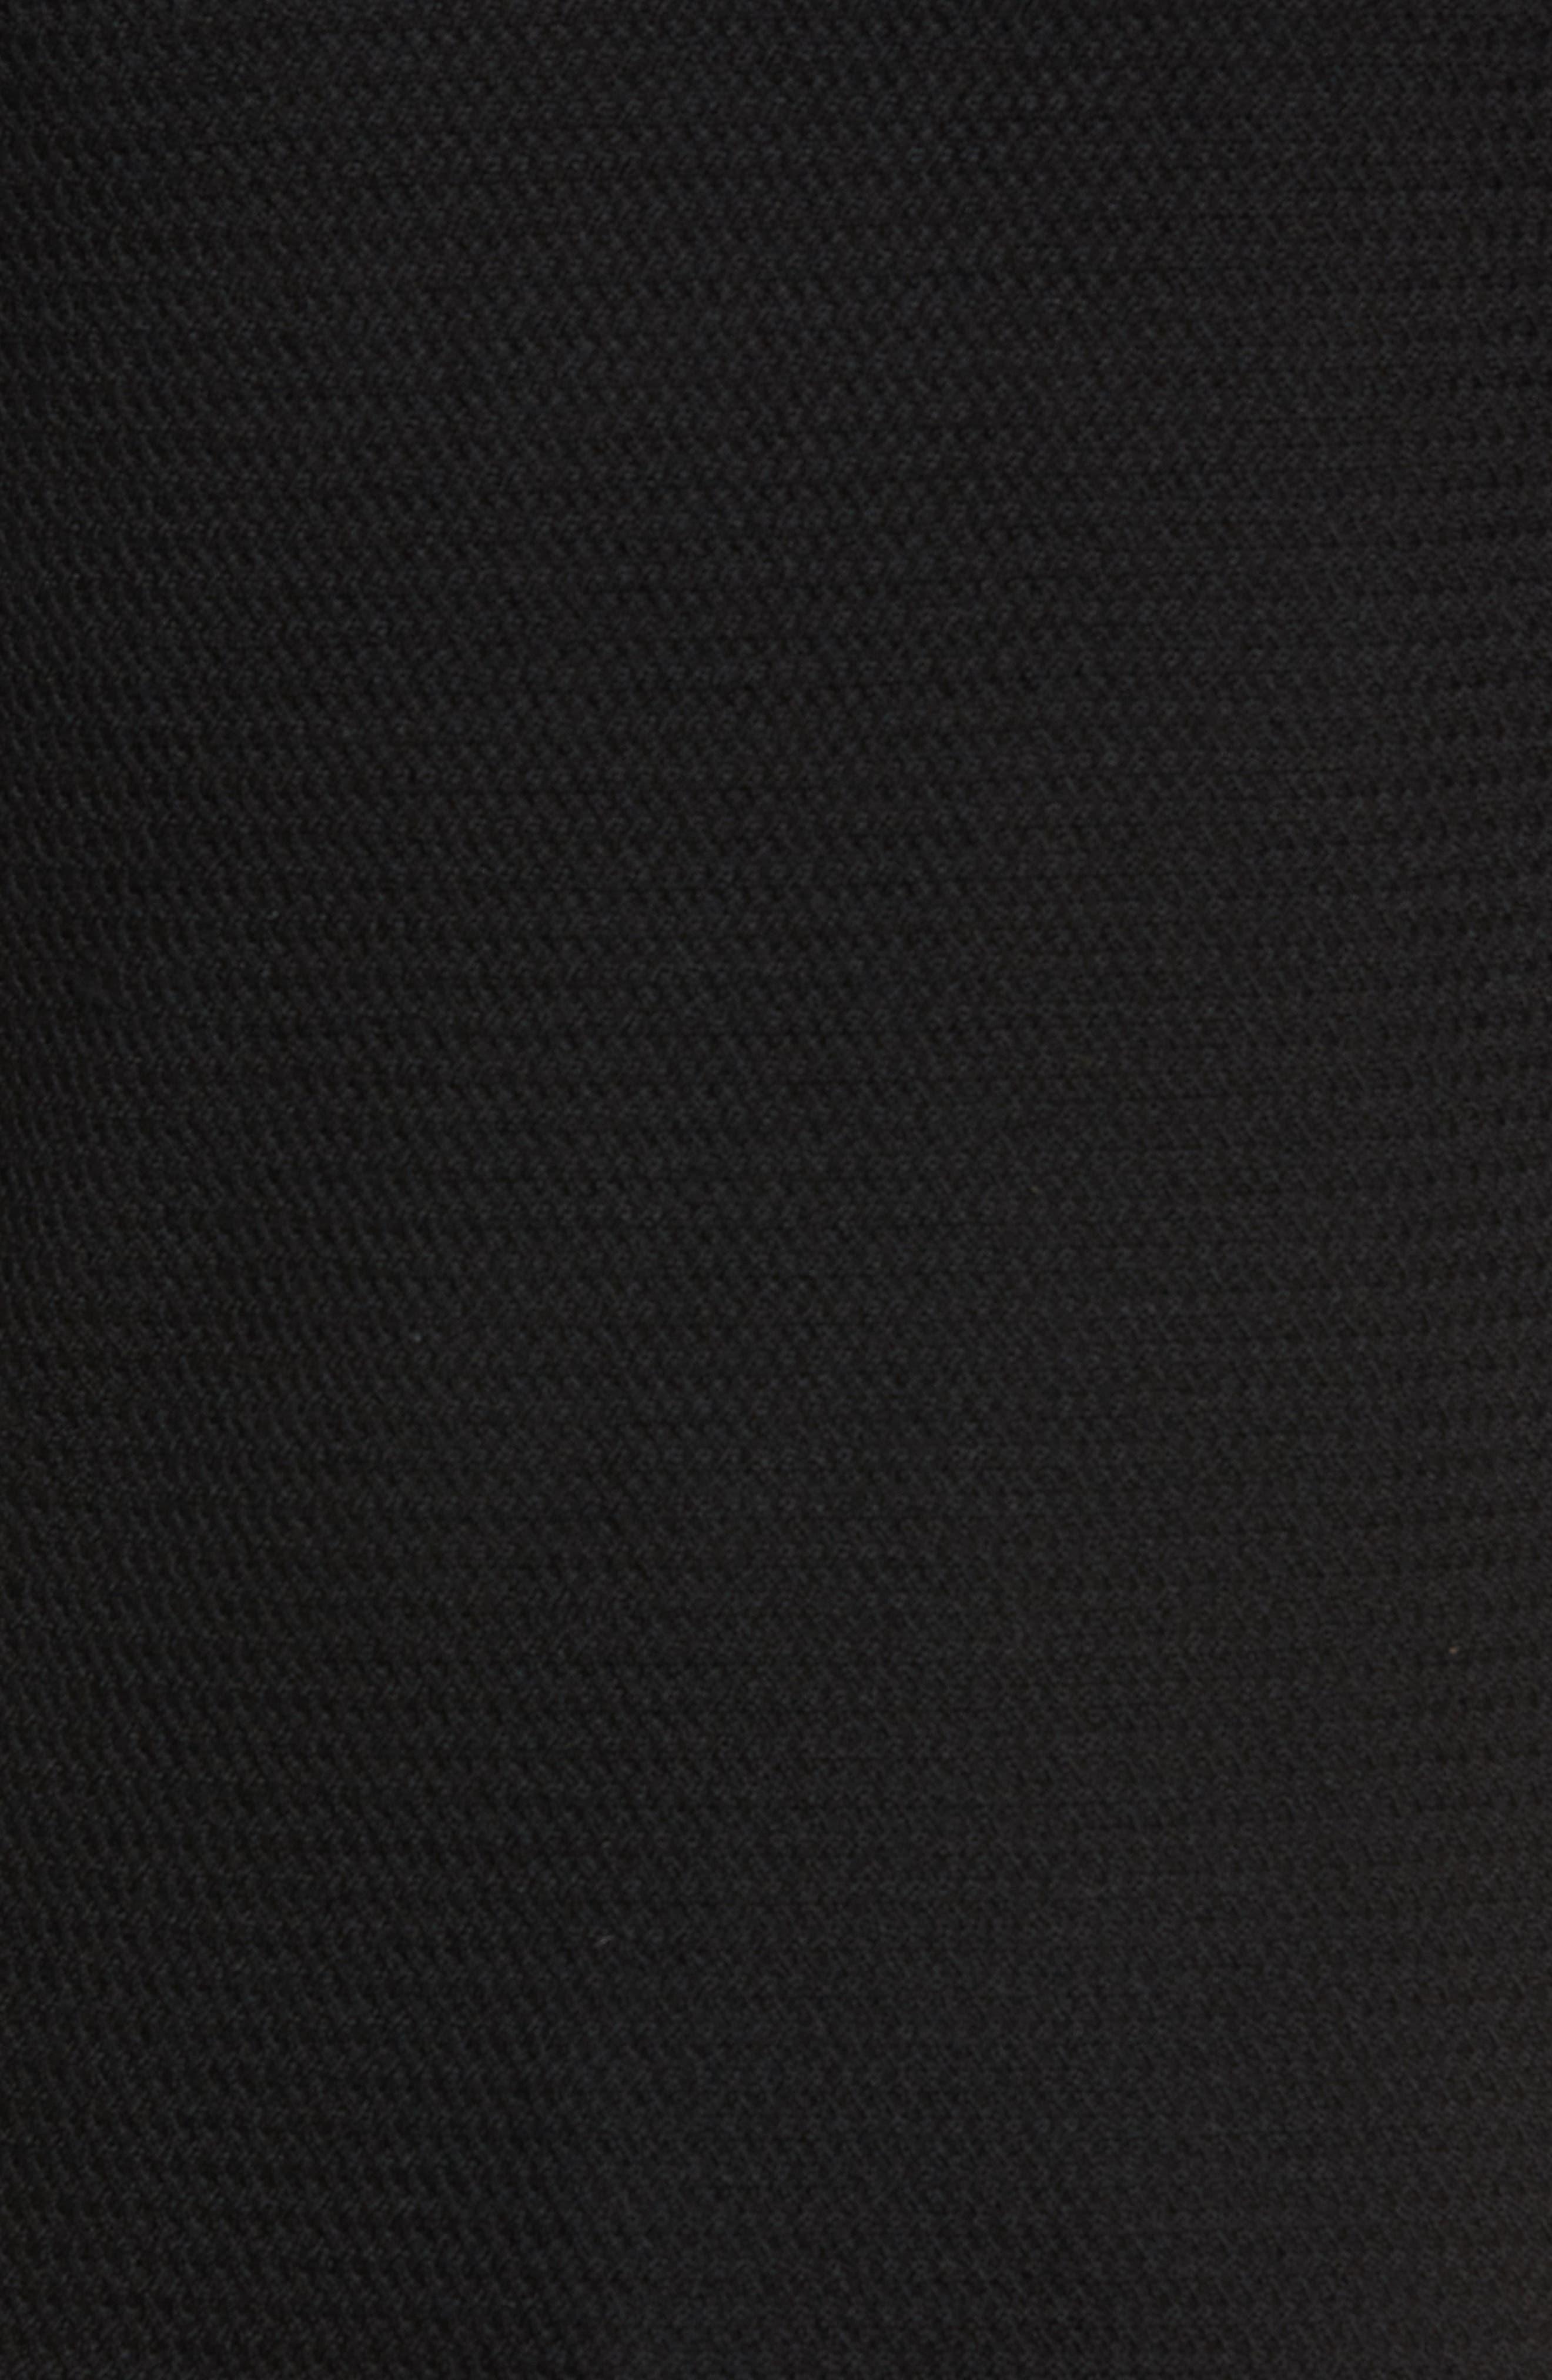 Hawthorn Wool Blend Thermal,                             Alternate thumbnail 5, color,                             BLACK